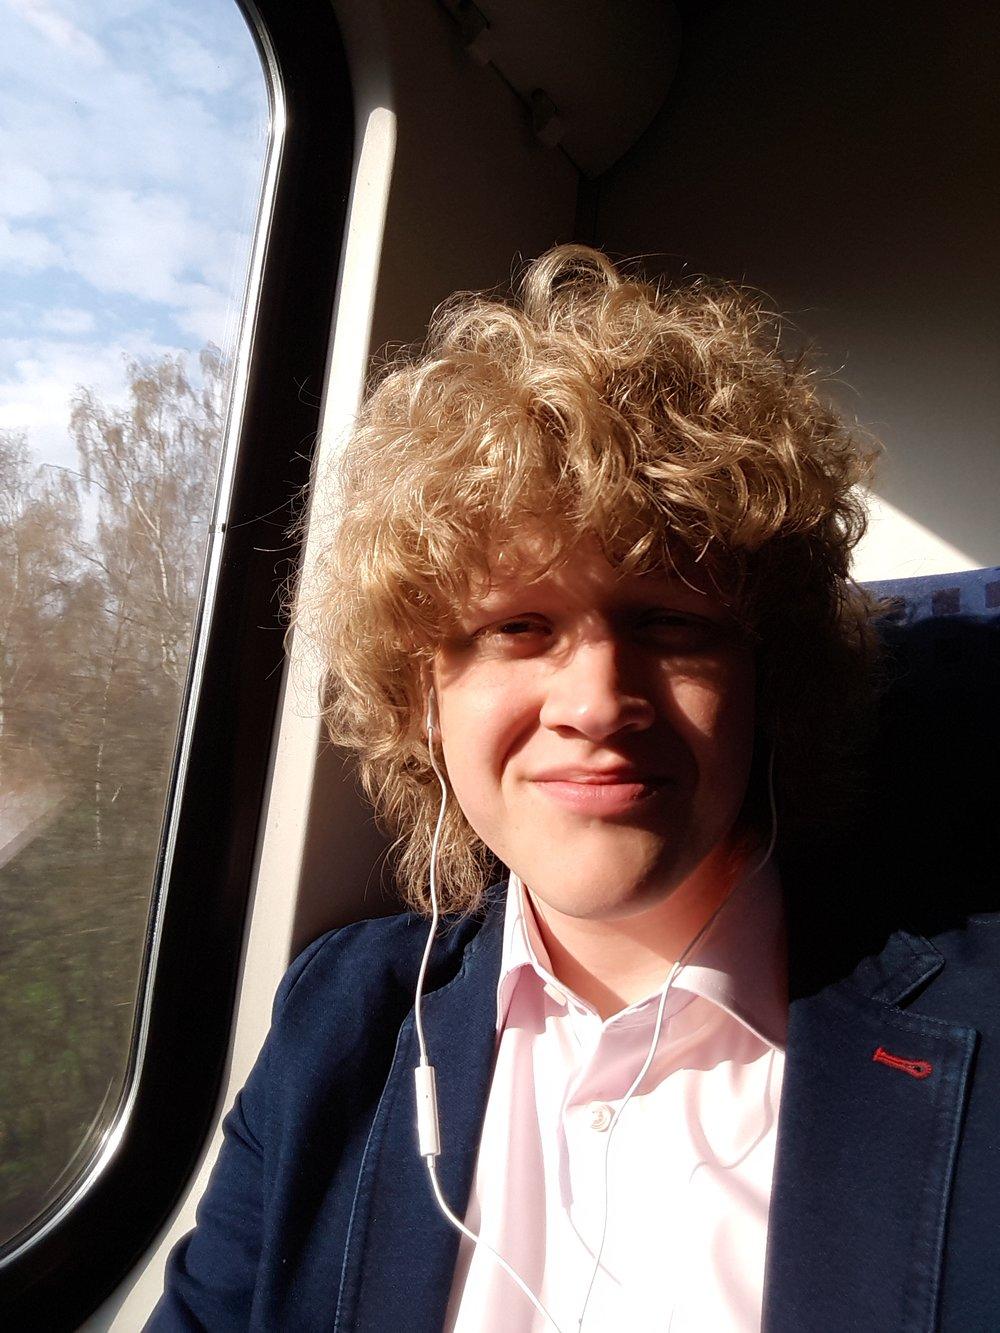 Me in the train to Frankfurt.